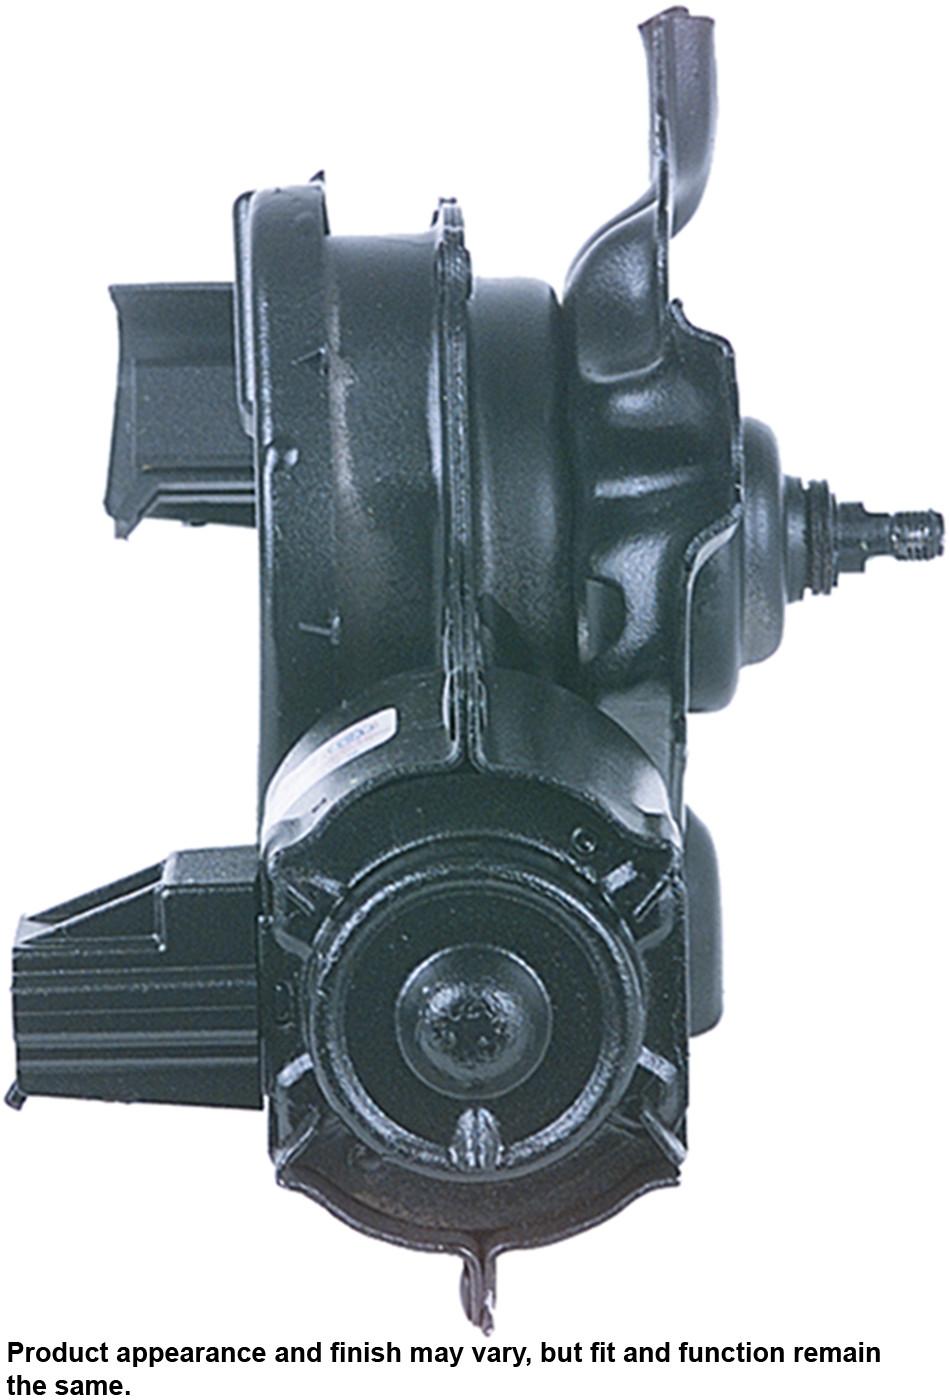 Imagen de Motor de Limpiaparabrisas para GMC G1500 1984 Marca CARDONE Número de Parte 40-182